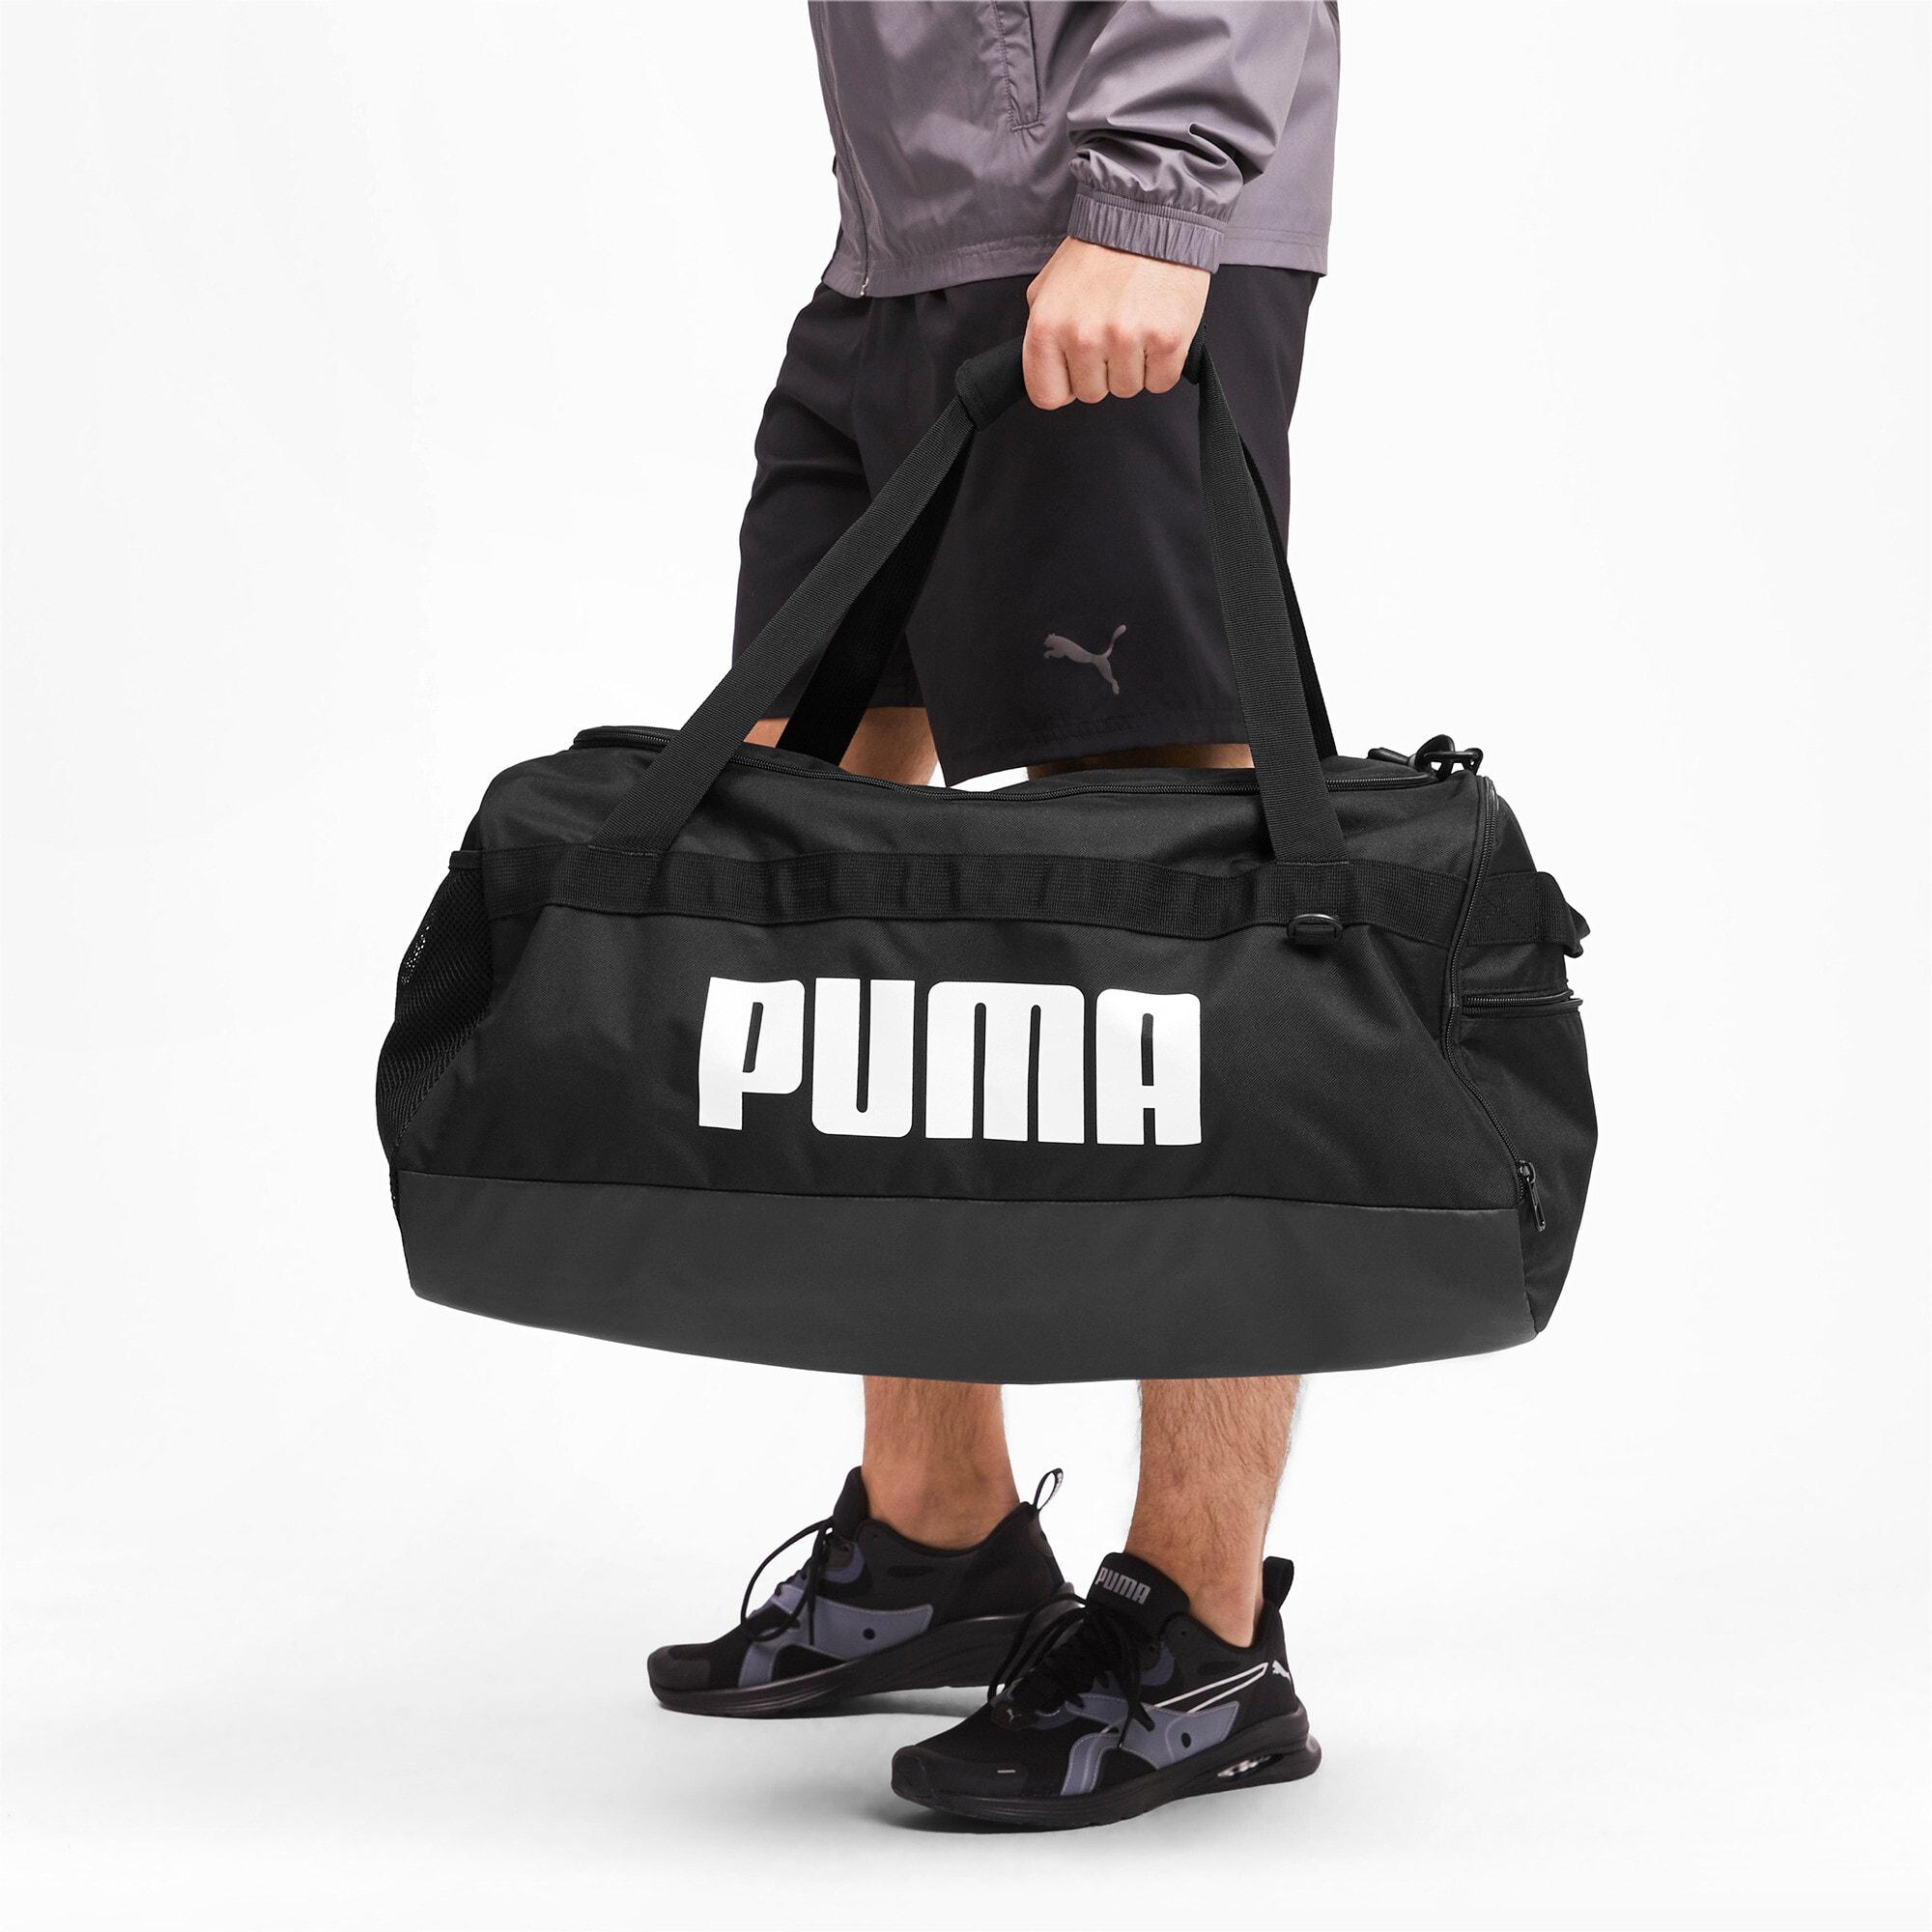 Thumbnail 2 of PUMA Challenger Duffel Bag, Puma Black, medium